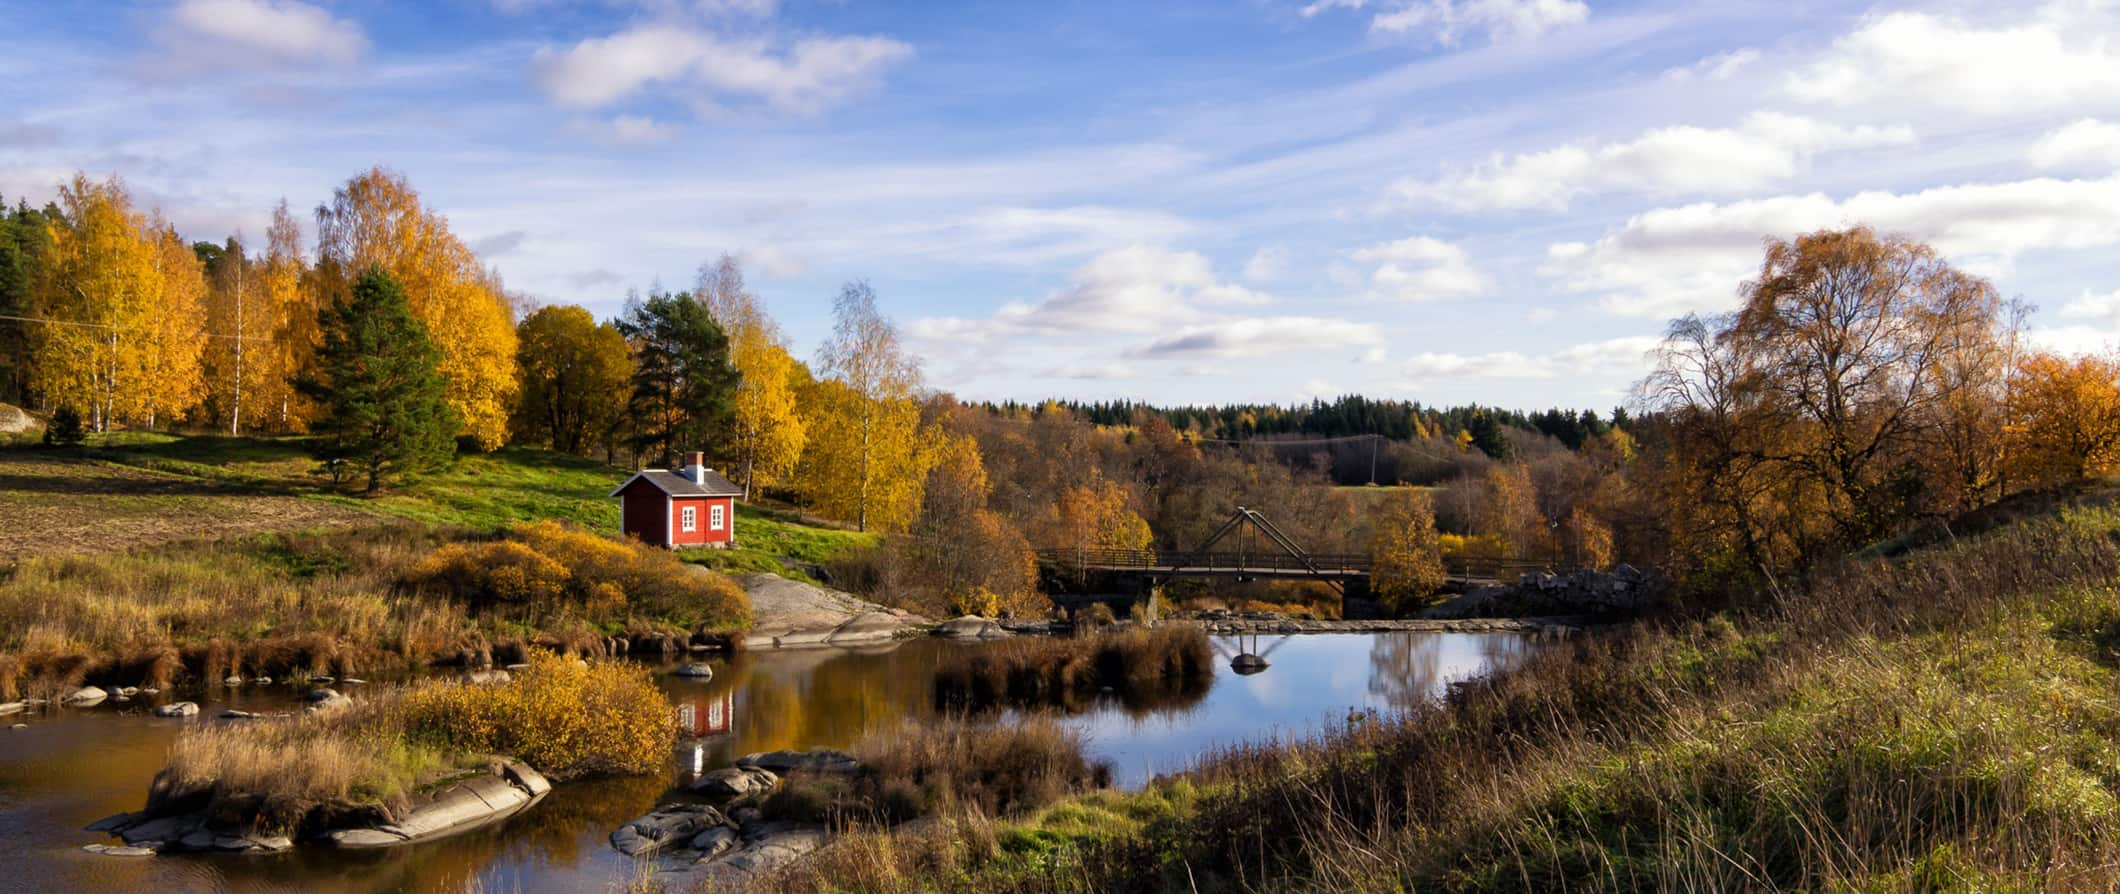 a serene nature scene in Finland